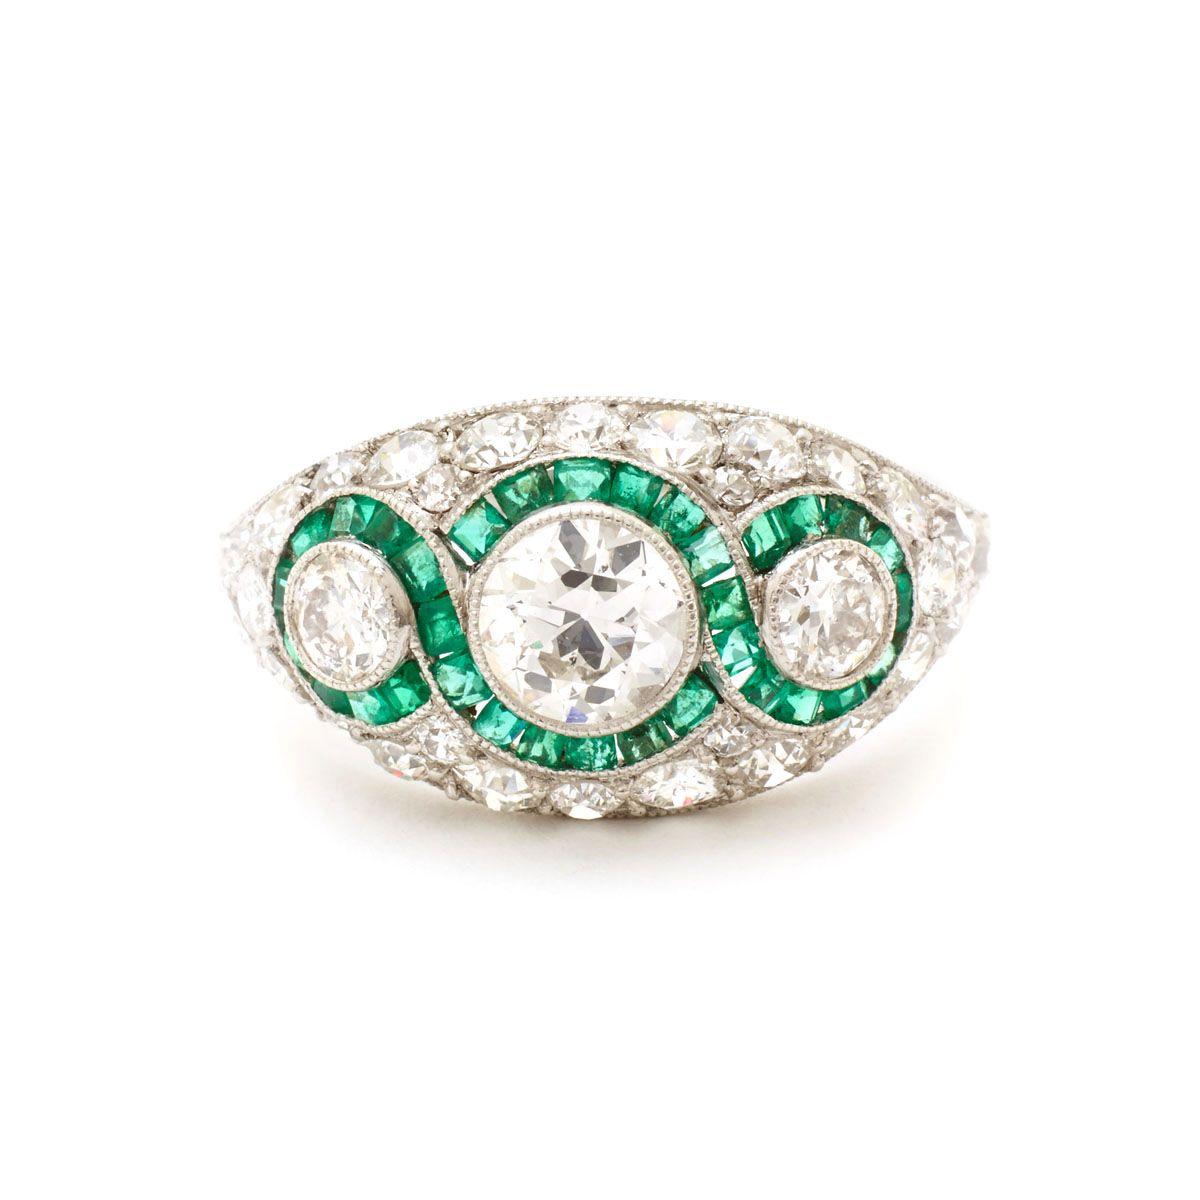 Artdecodiamondandgreenemeraldringa: Wedding Ring Art Deco Adver At Reisefeber.org